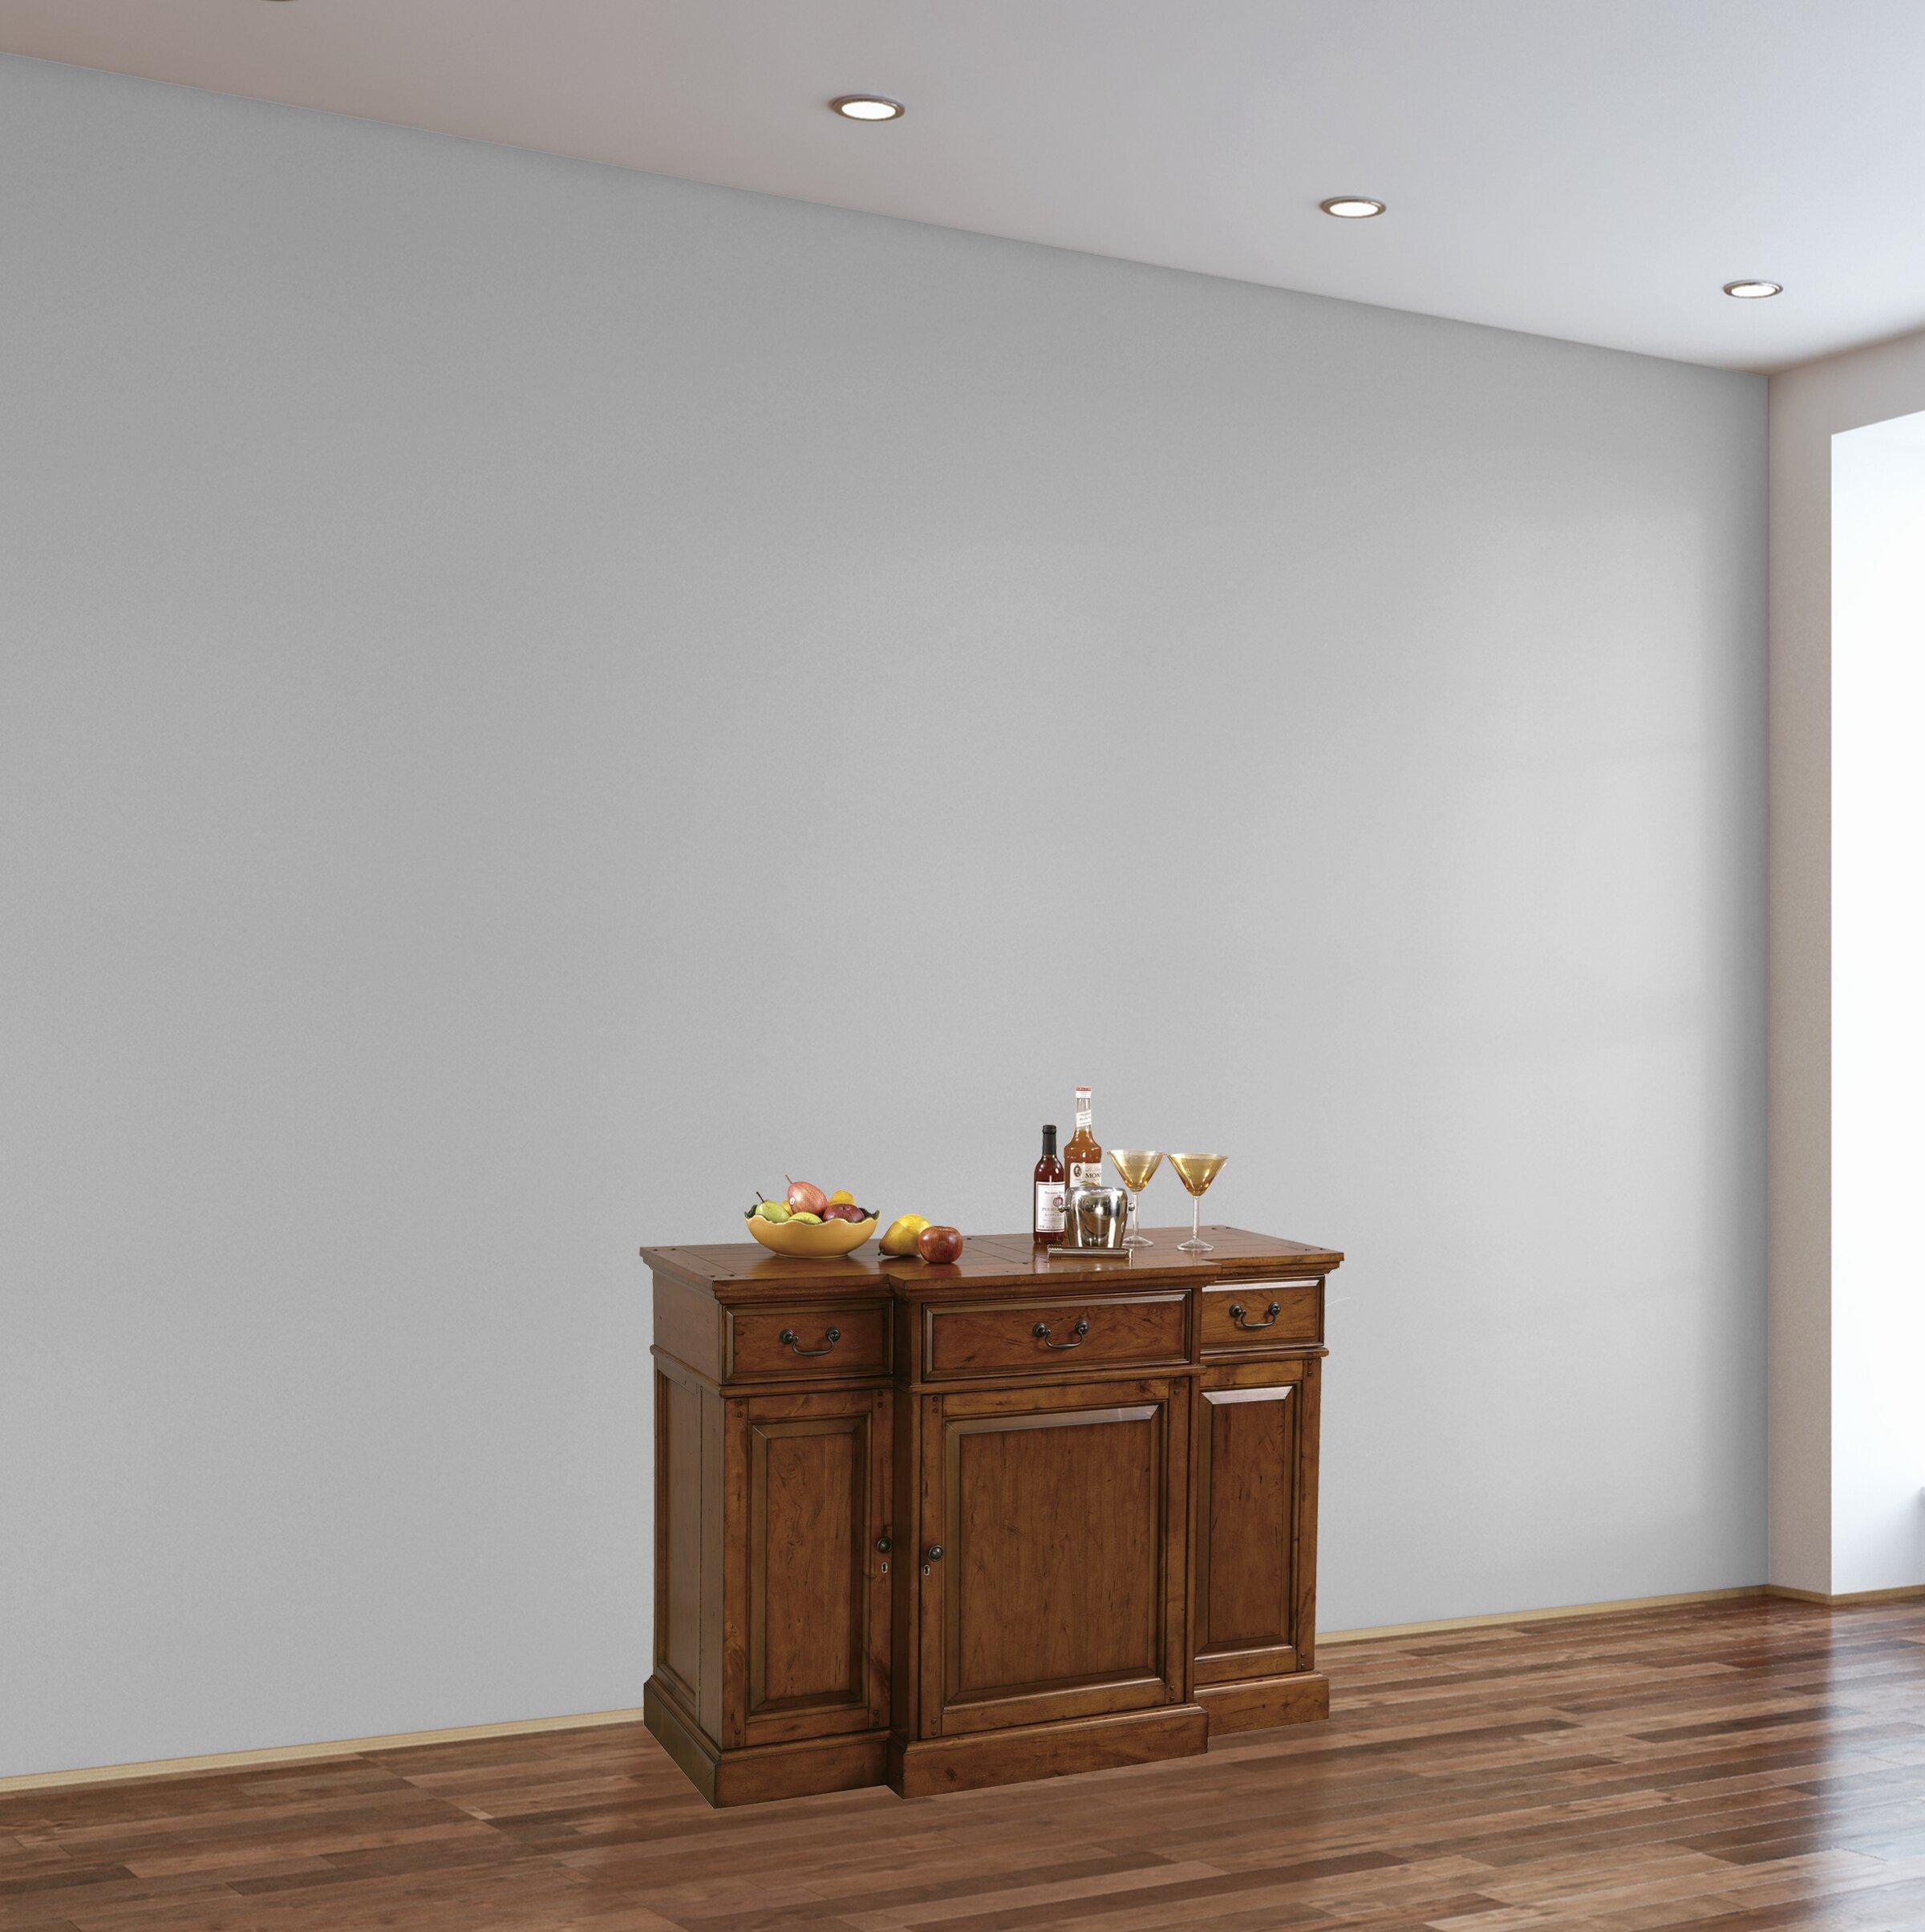 Darby Home Co Breslin Bar Cabinet | Wayfair